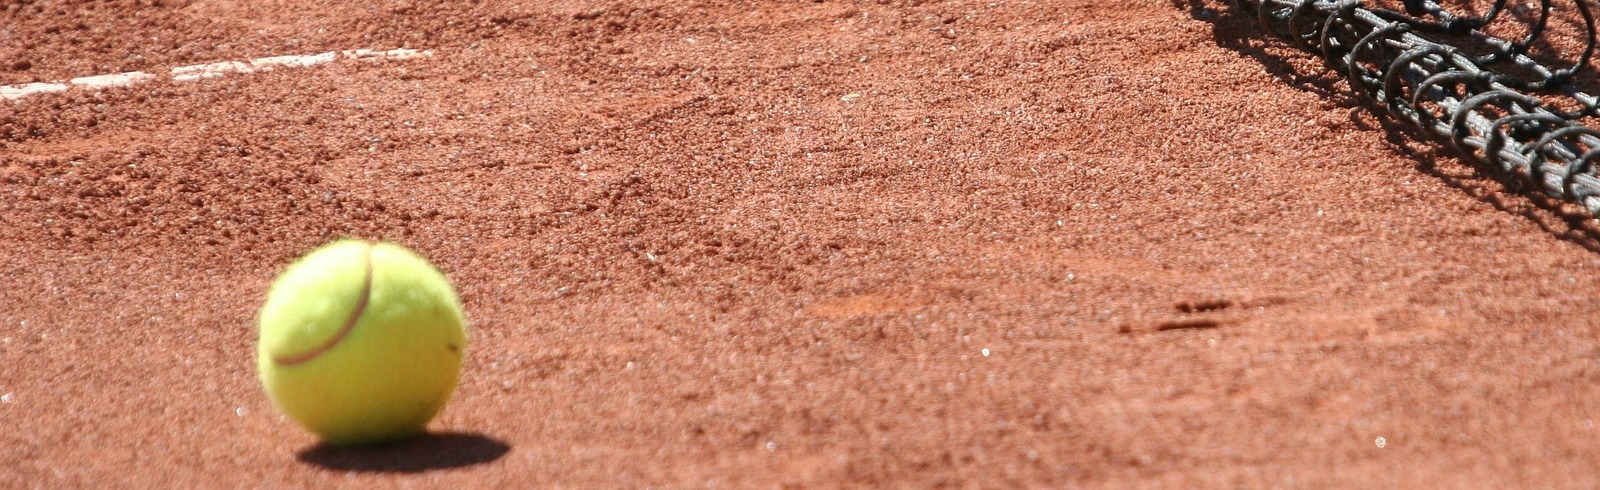 terrain et balle de tennis